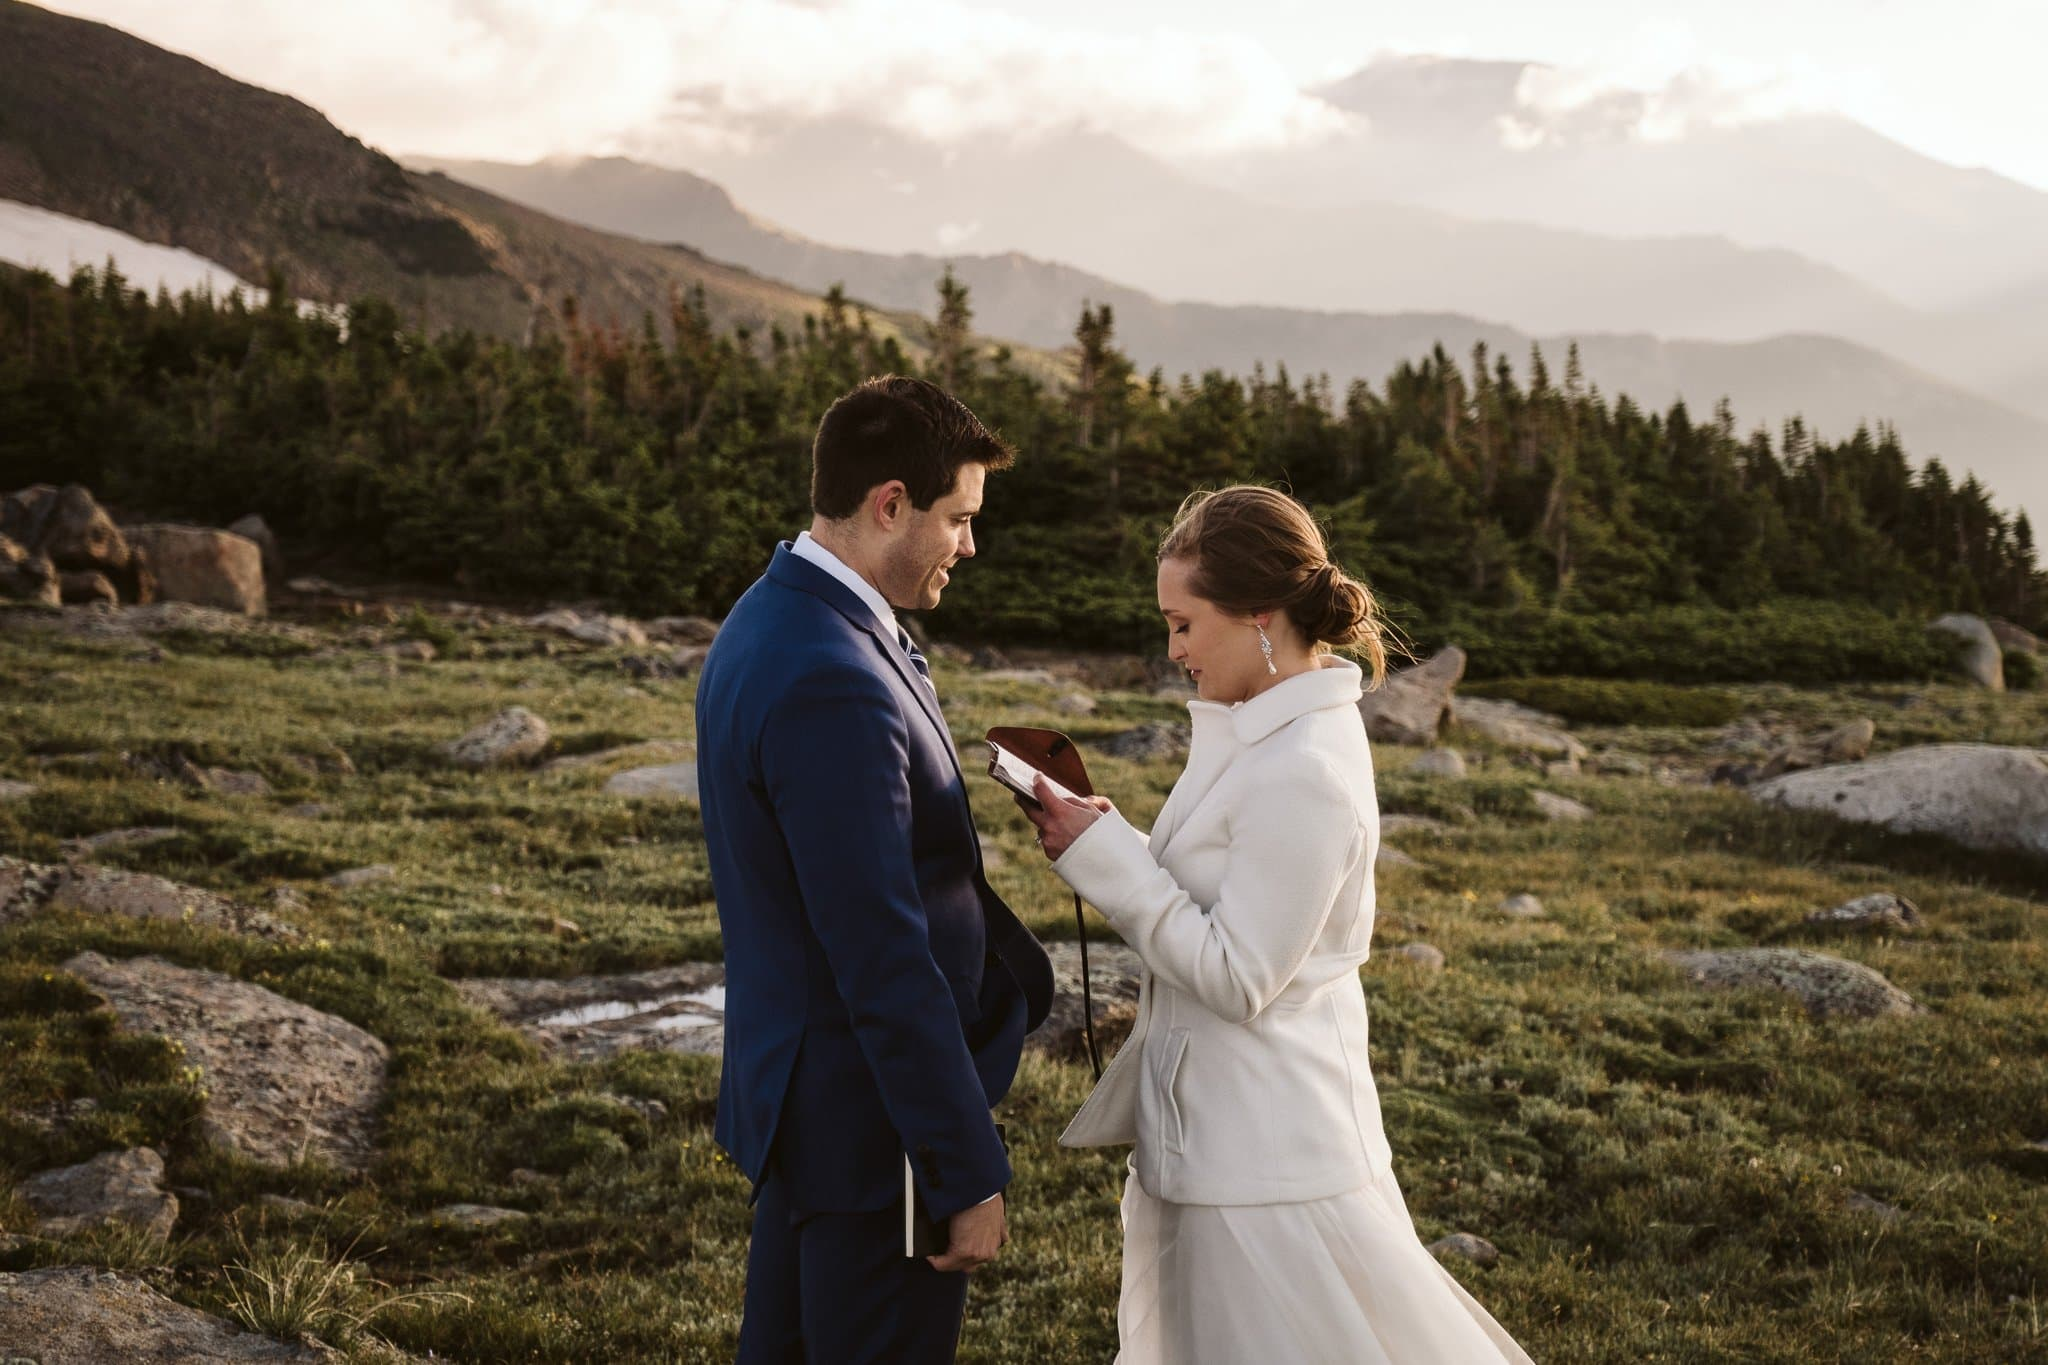 Elopement vow exchange in the mountains, Colorado adventure elopement